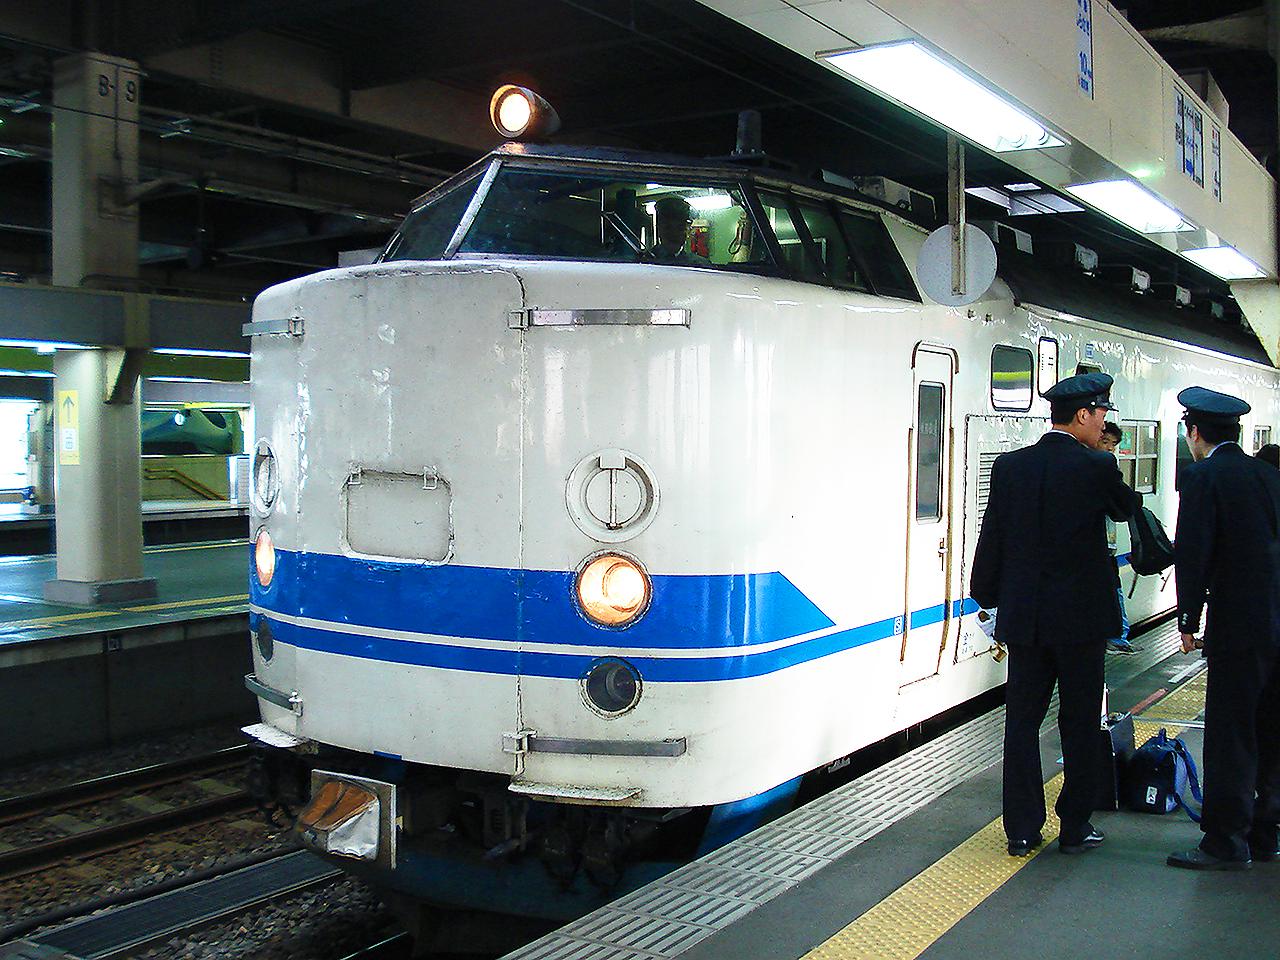 http://moritetsu.info/train/img/DSC02378ss.jpg